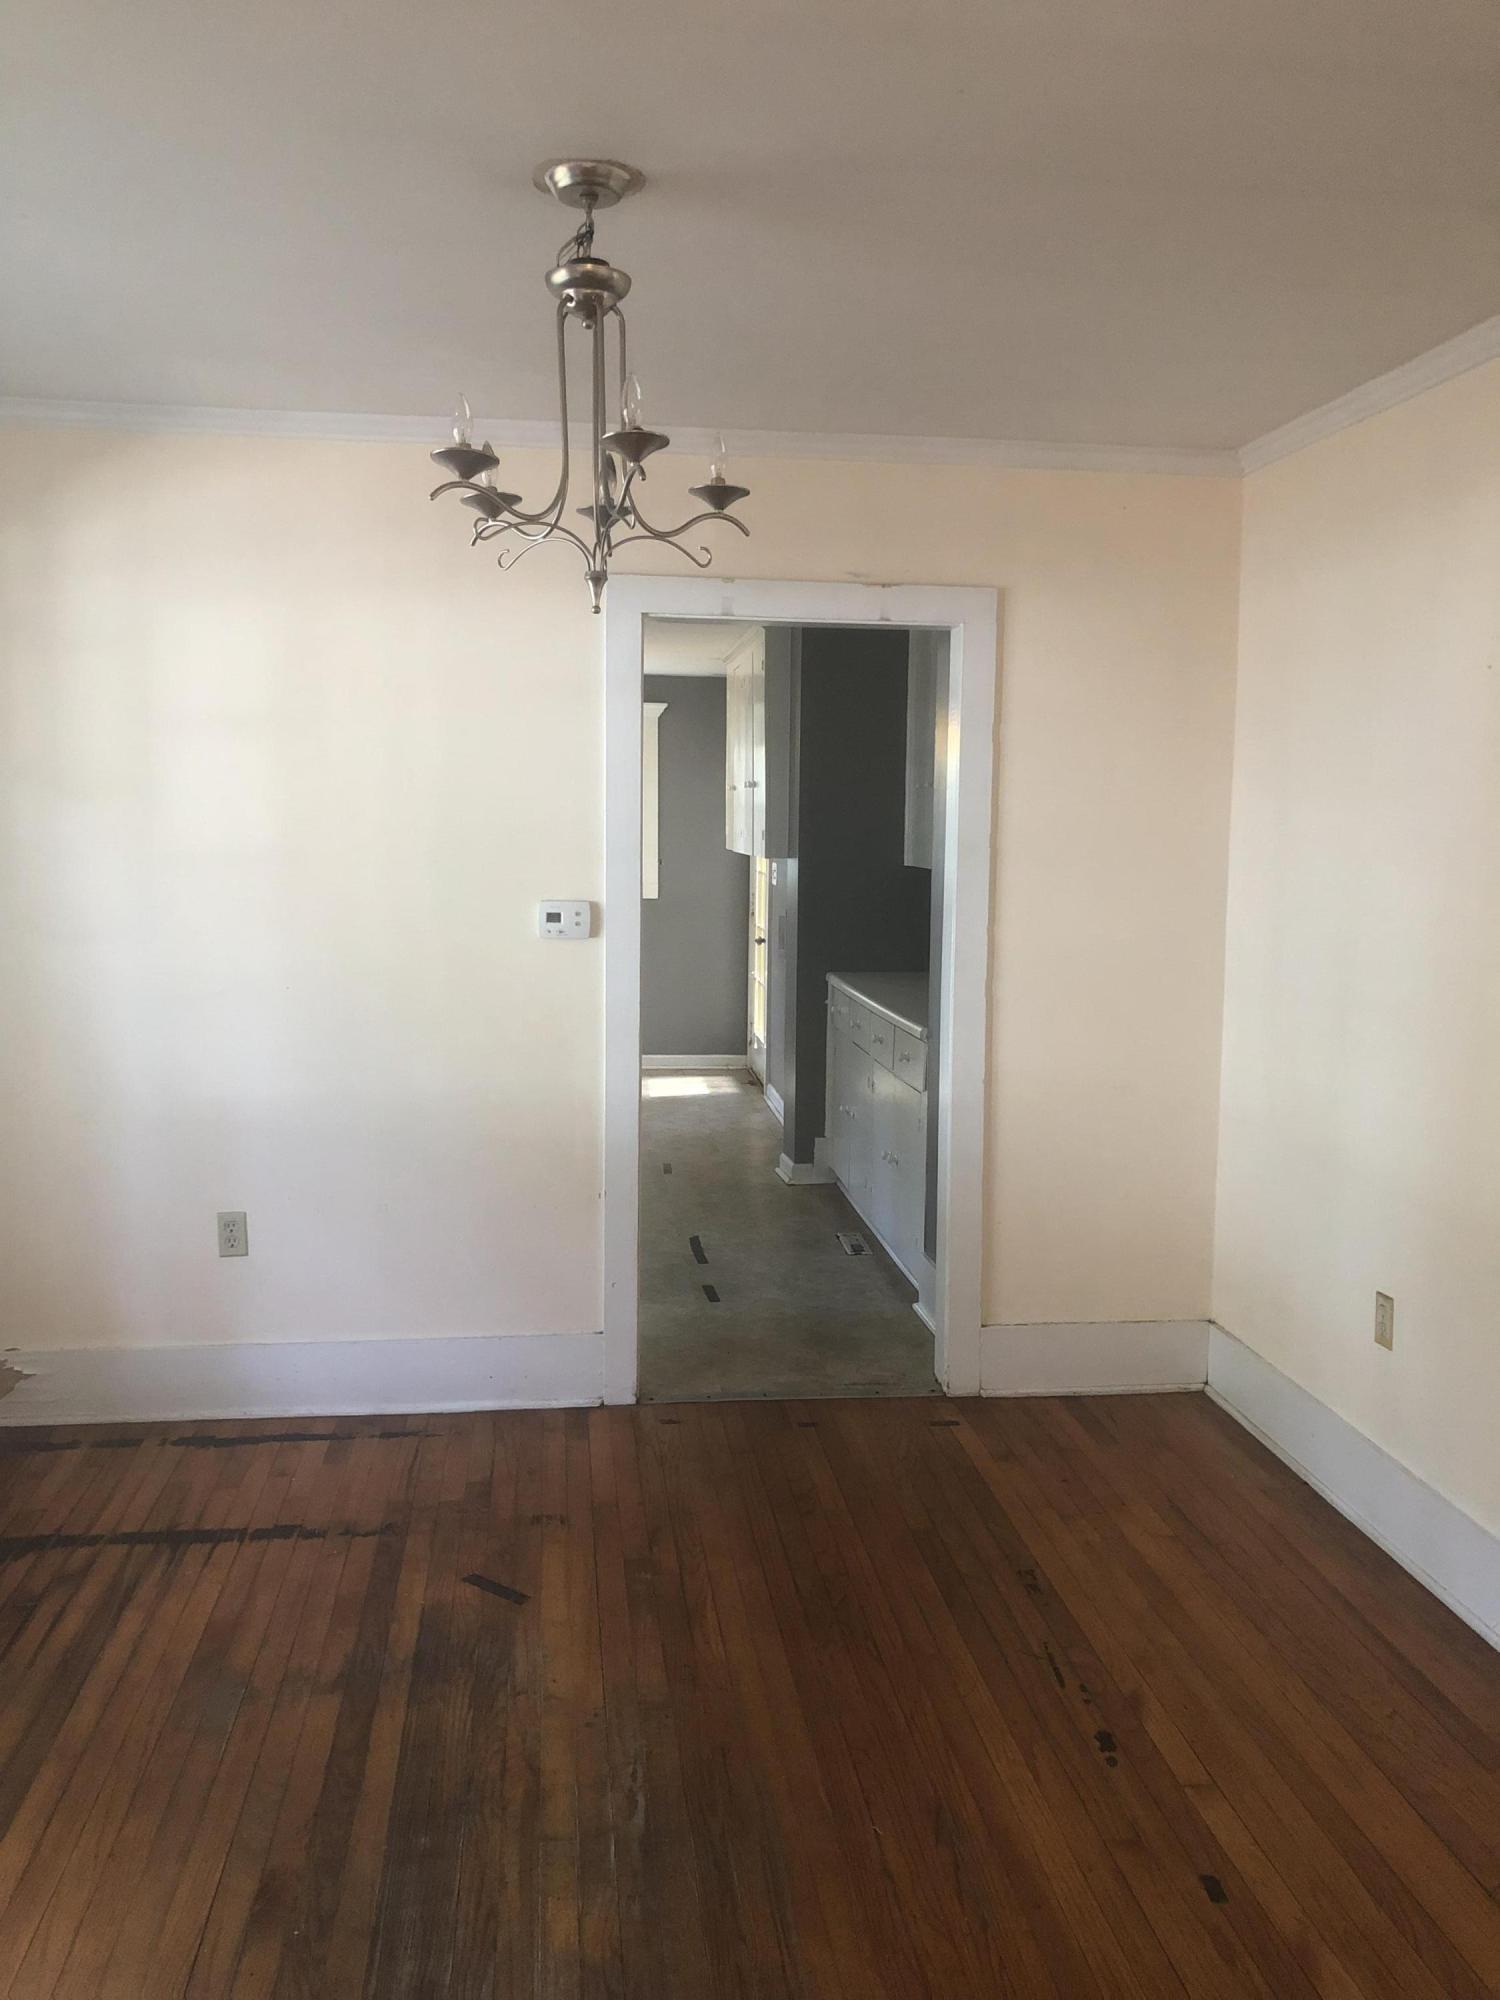 Old Mt Pleasant Homes For Sale - 733 Adluh, Mount Pleasant, SC - 4